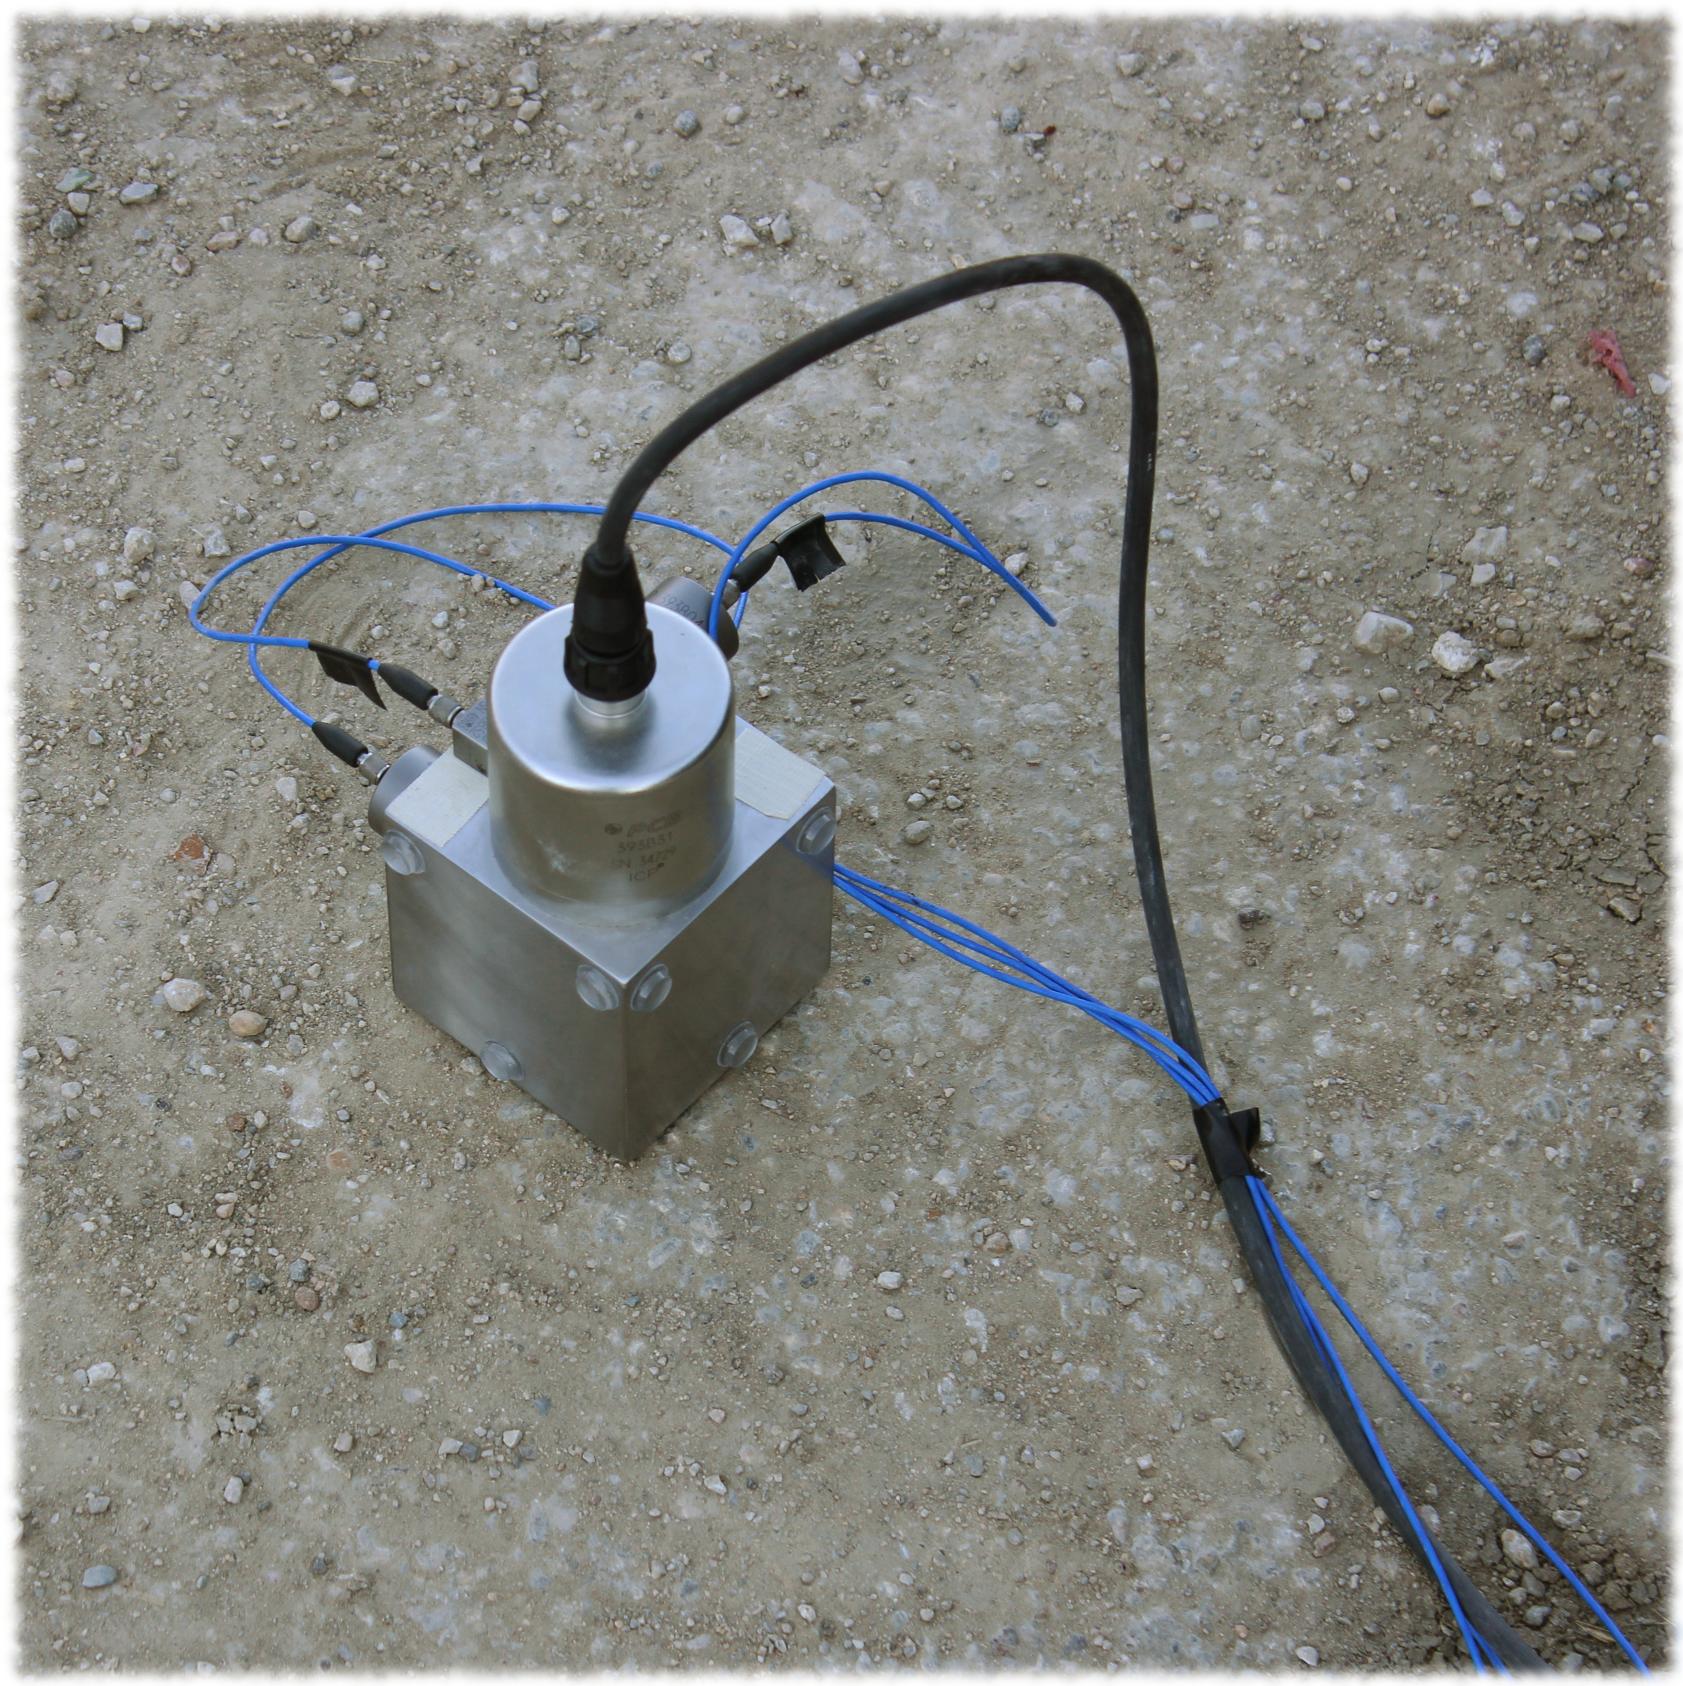 3-Axis Accelerometer Measurement